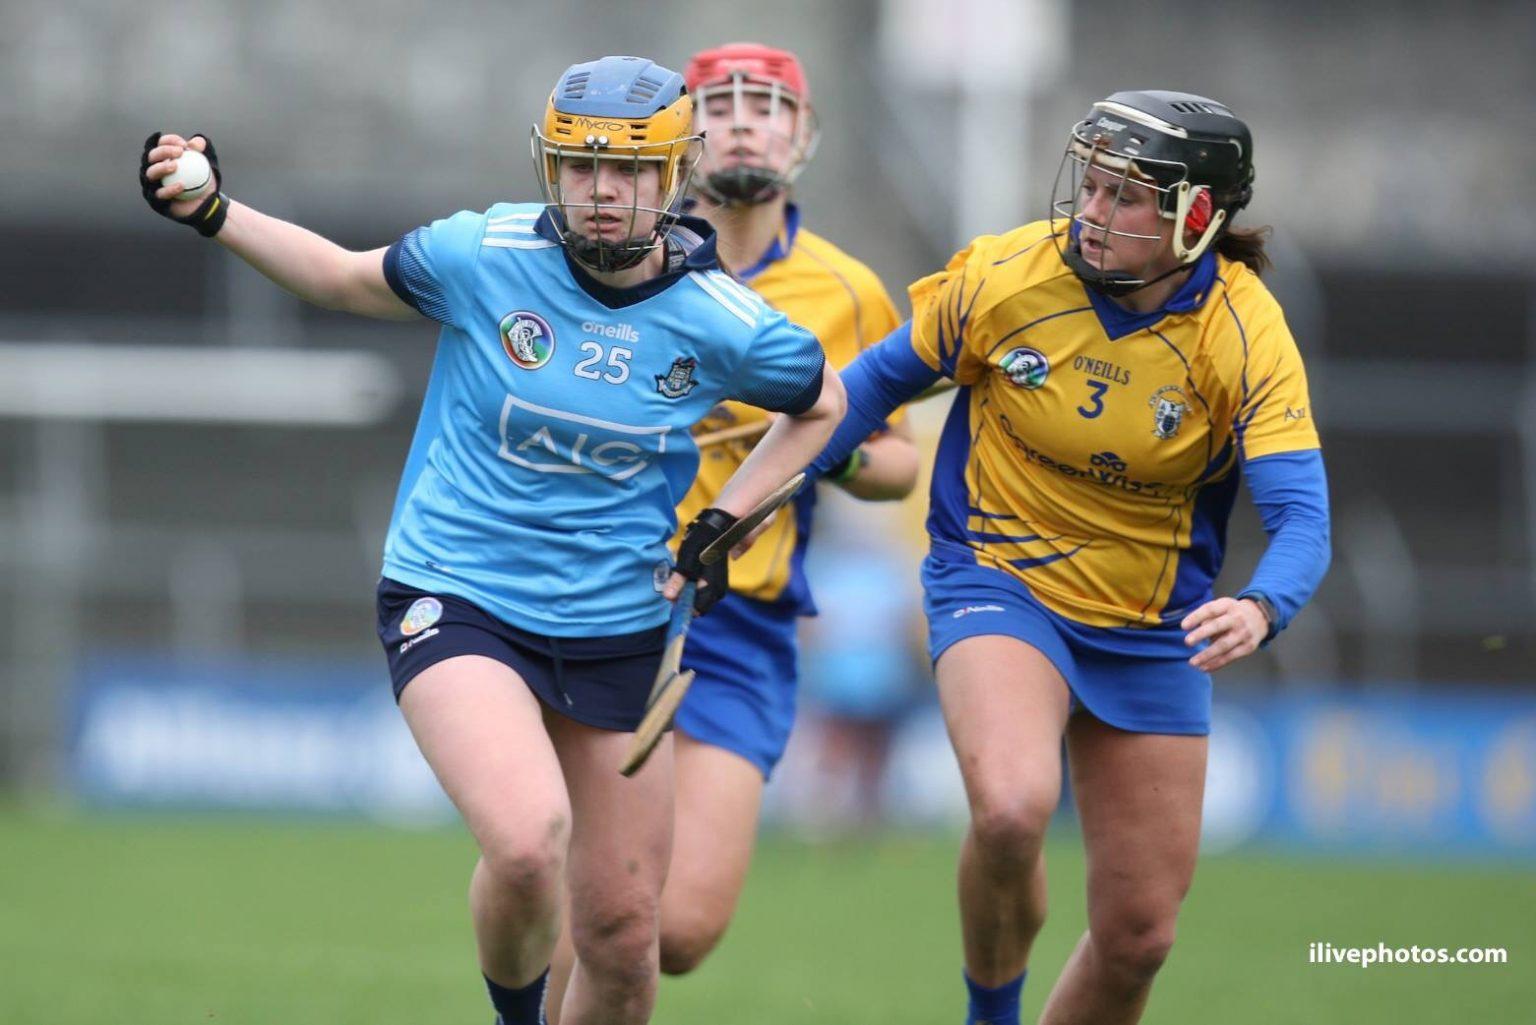 Dublin Senior Camogie Player in a sky blue jersey, navy skort and blue and yellow helmet breaks past a Clare player in a yellow and blue jersey, blue Skort and black helmet